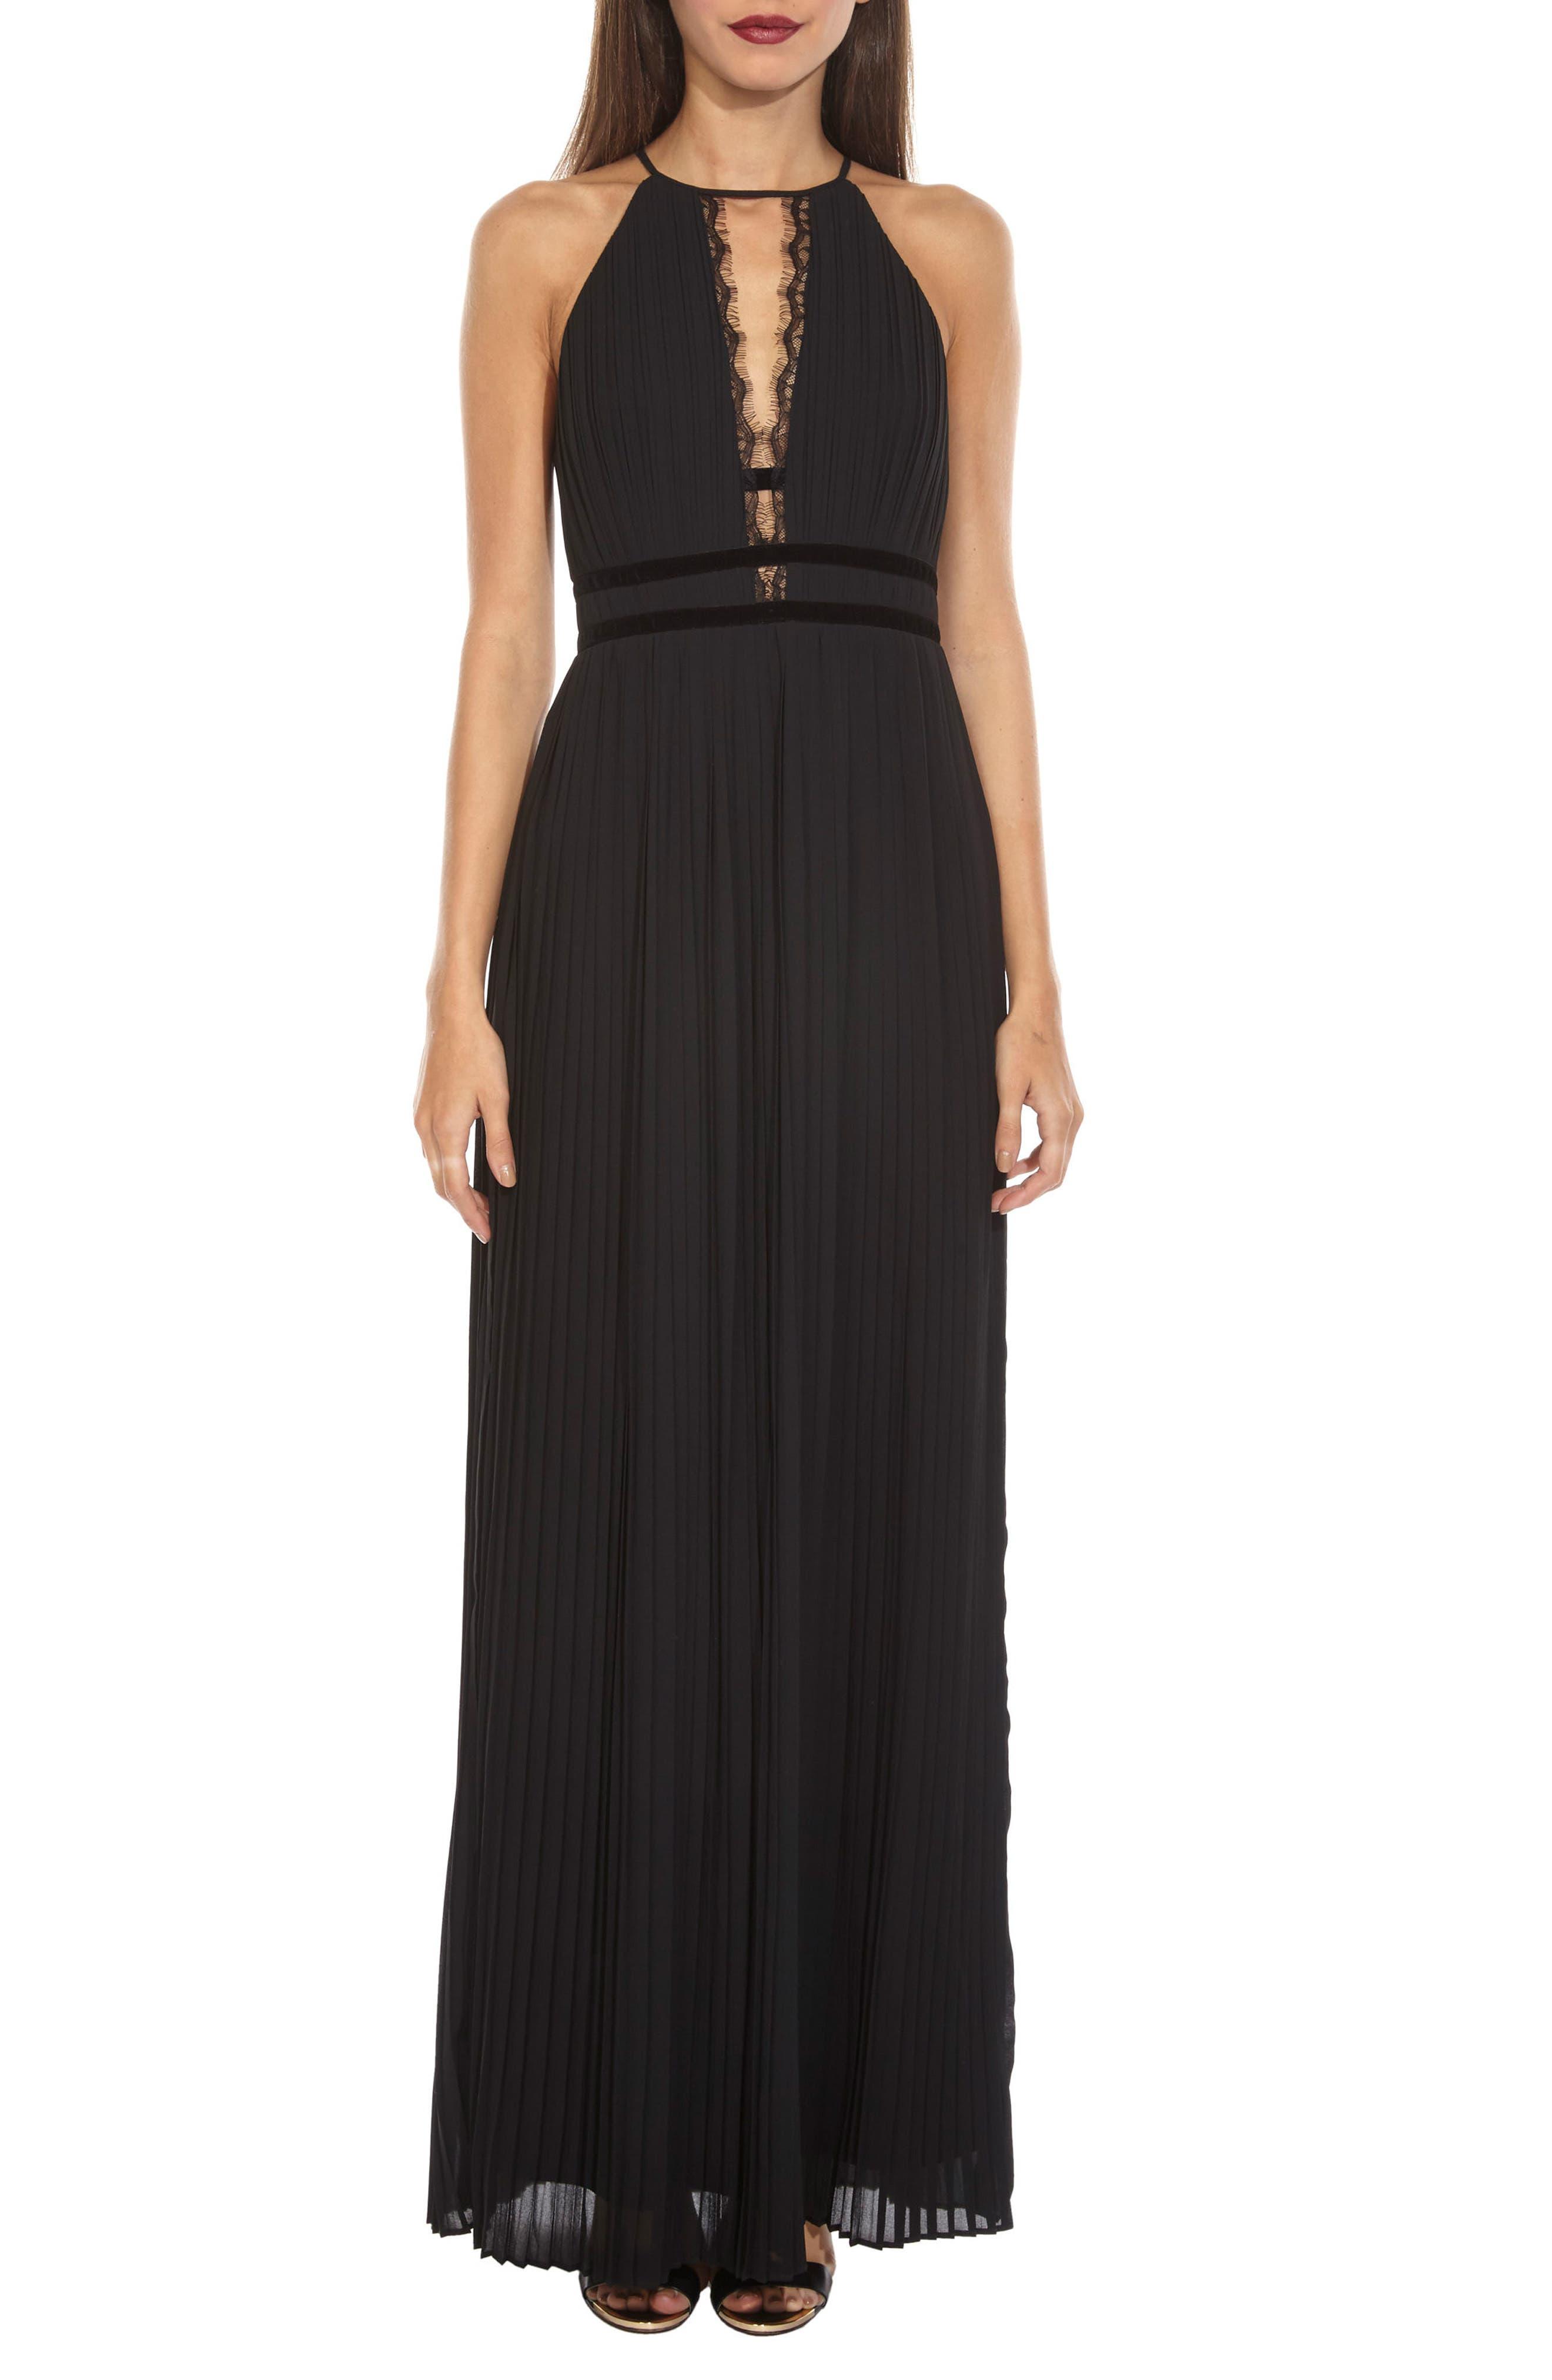 Aberda Plunging Keyhole Maxi Dress,                         Main,                         color, 001